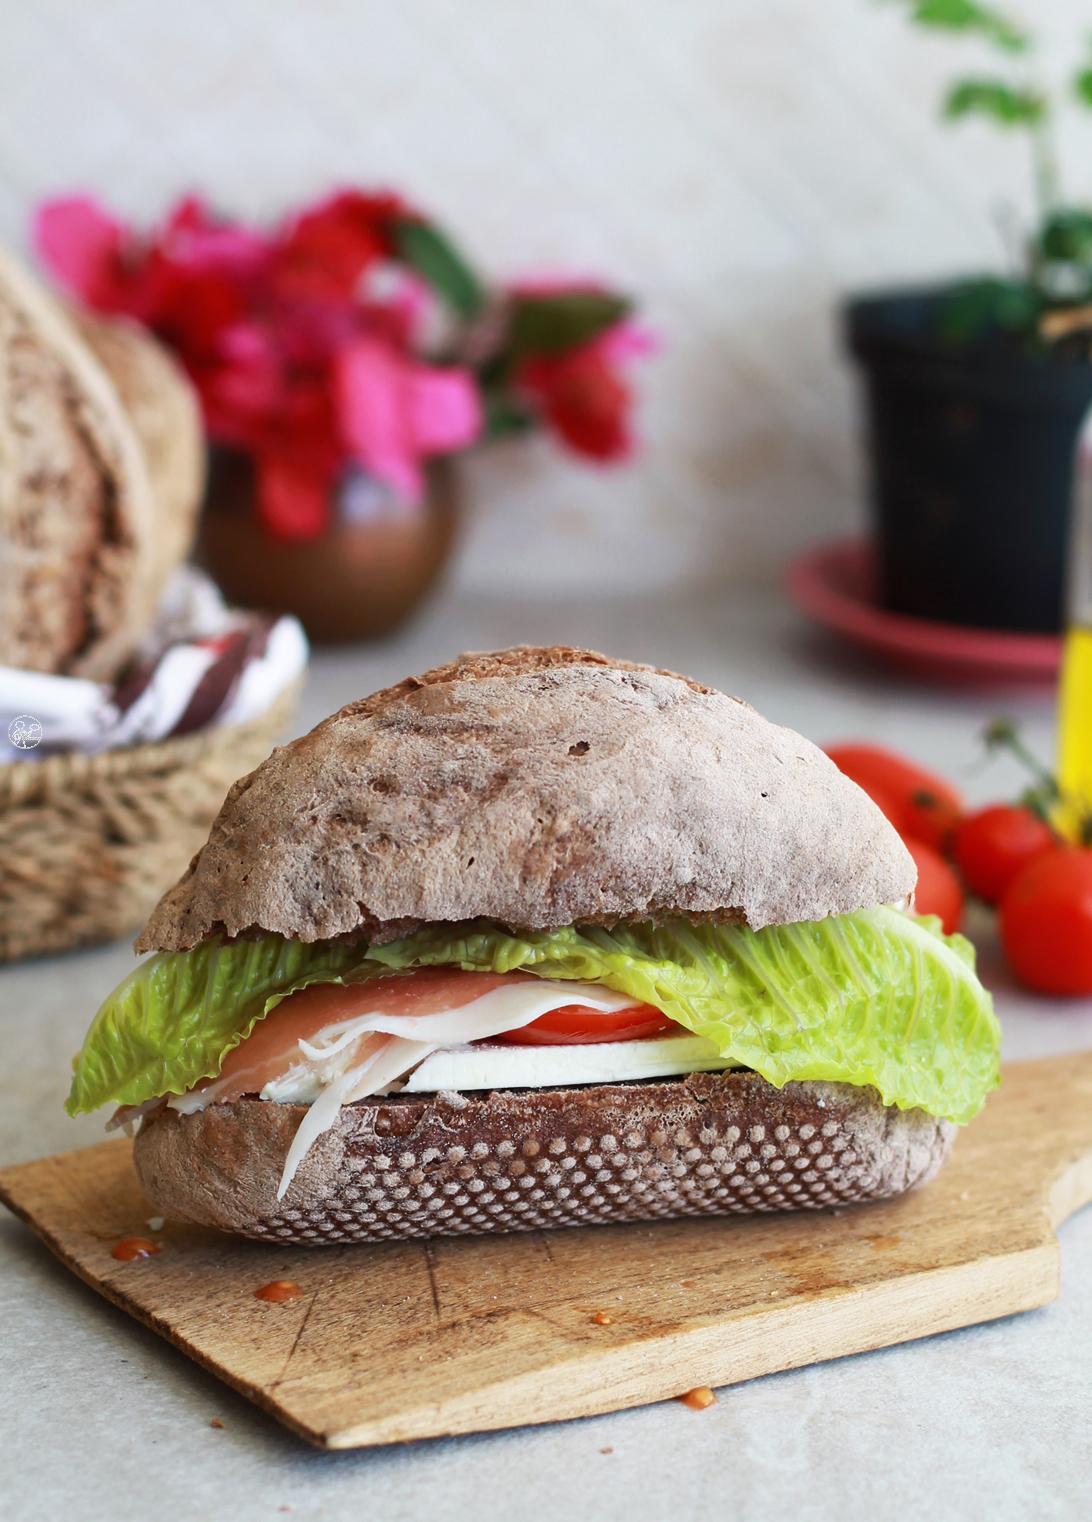 Panini multicereali senza glutine - La Cassata Celiaca